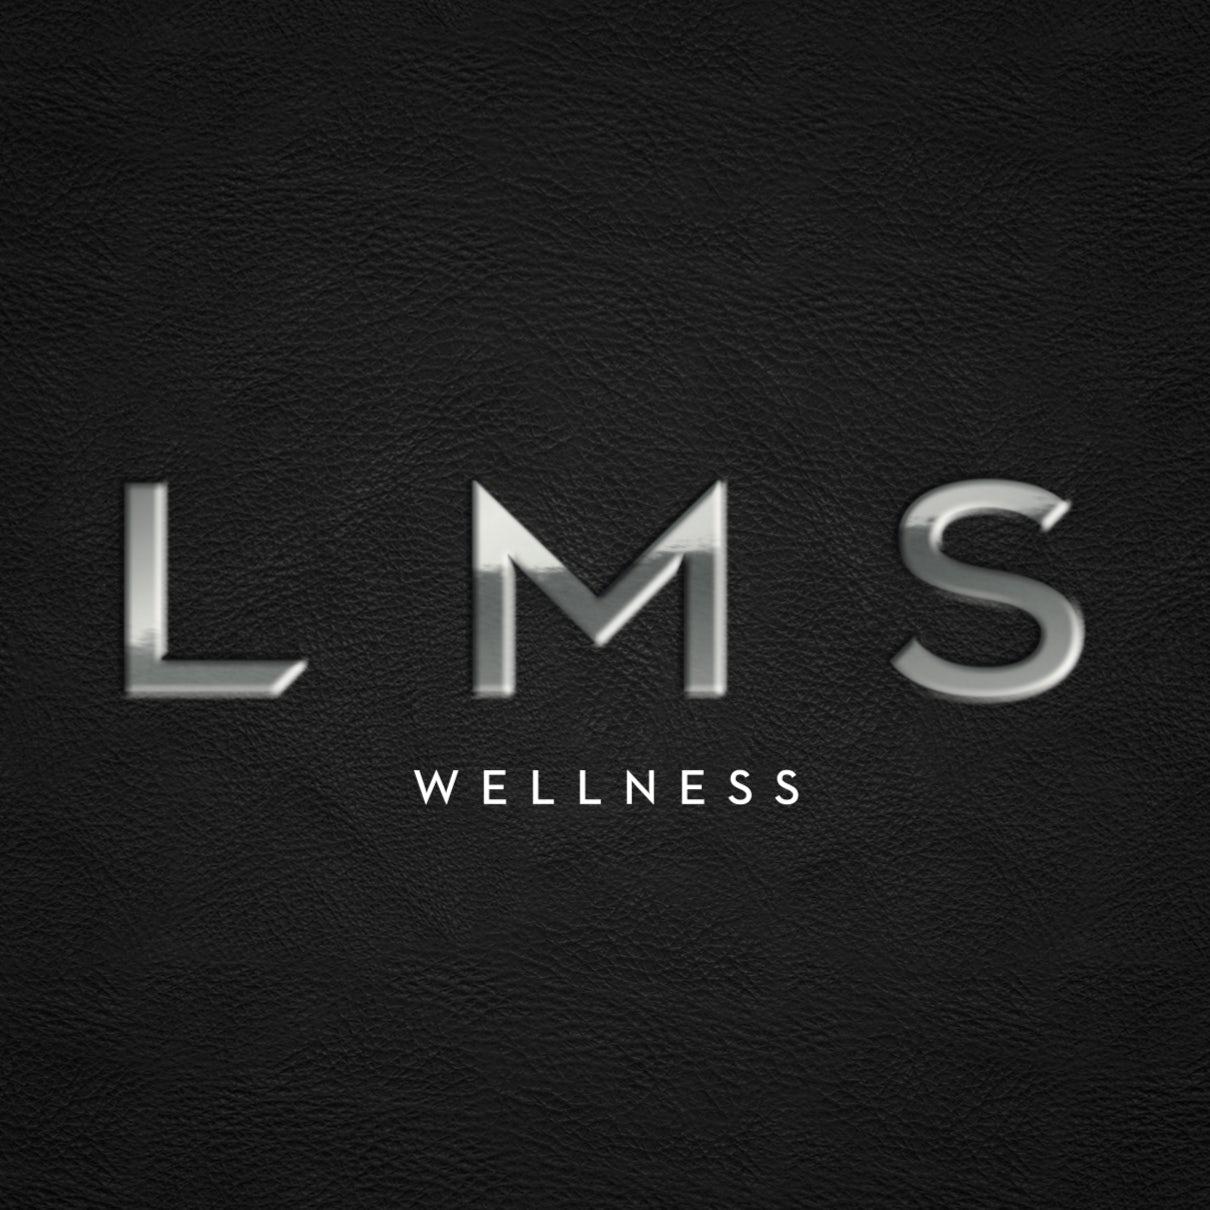 LMS Wellness company logo